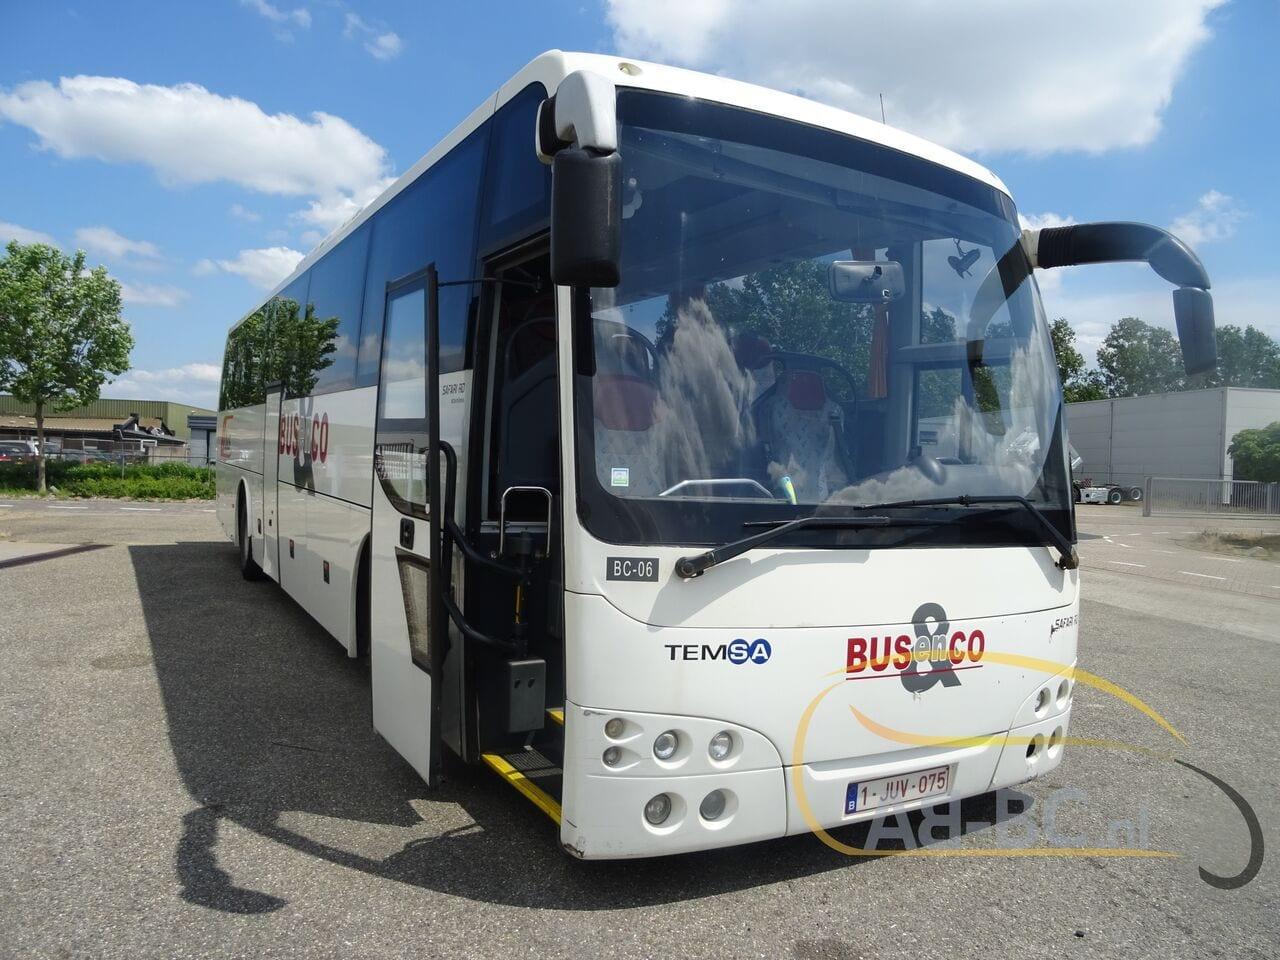 coach-busTEMSA-Safari-RD-DAF-Motor-53-Seats-Euro-5---1623932761339746966_big_3bc228280f21a6bea9599c2cece12847--21061715155620919600